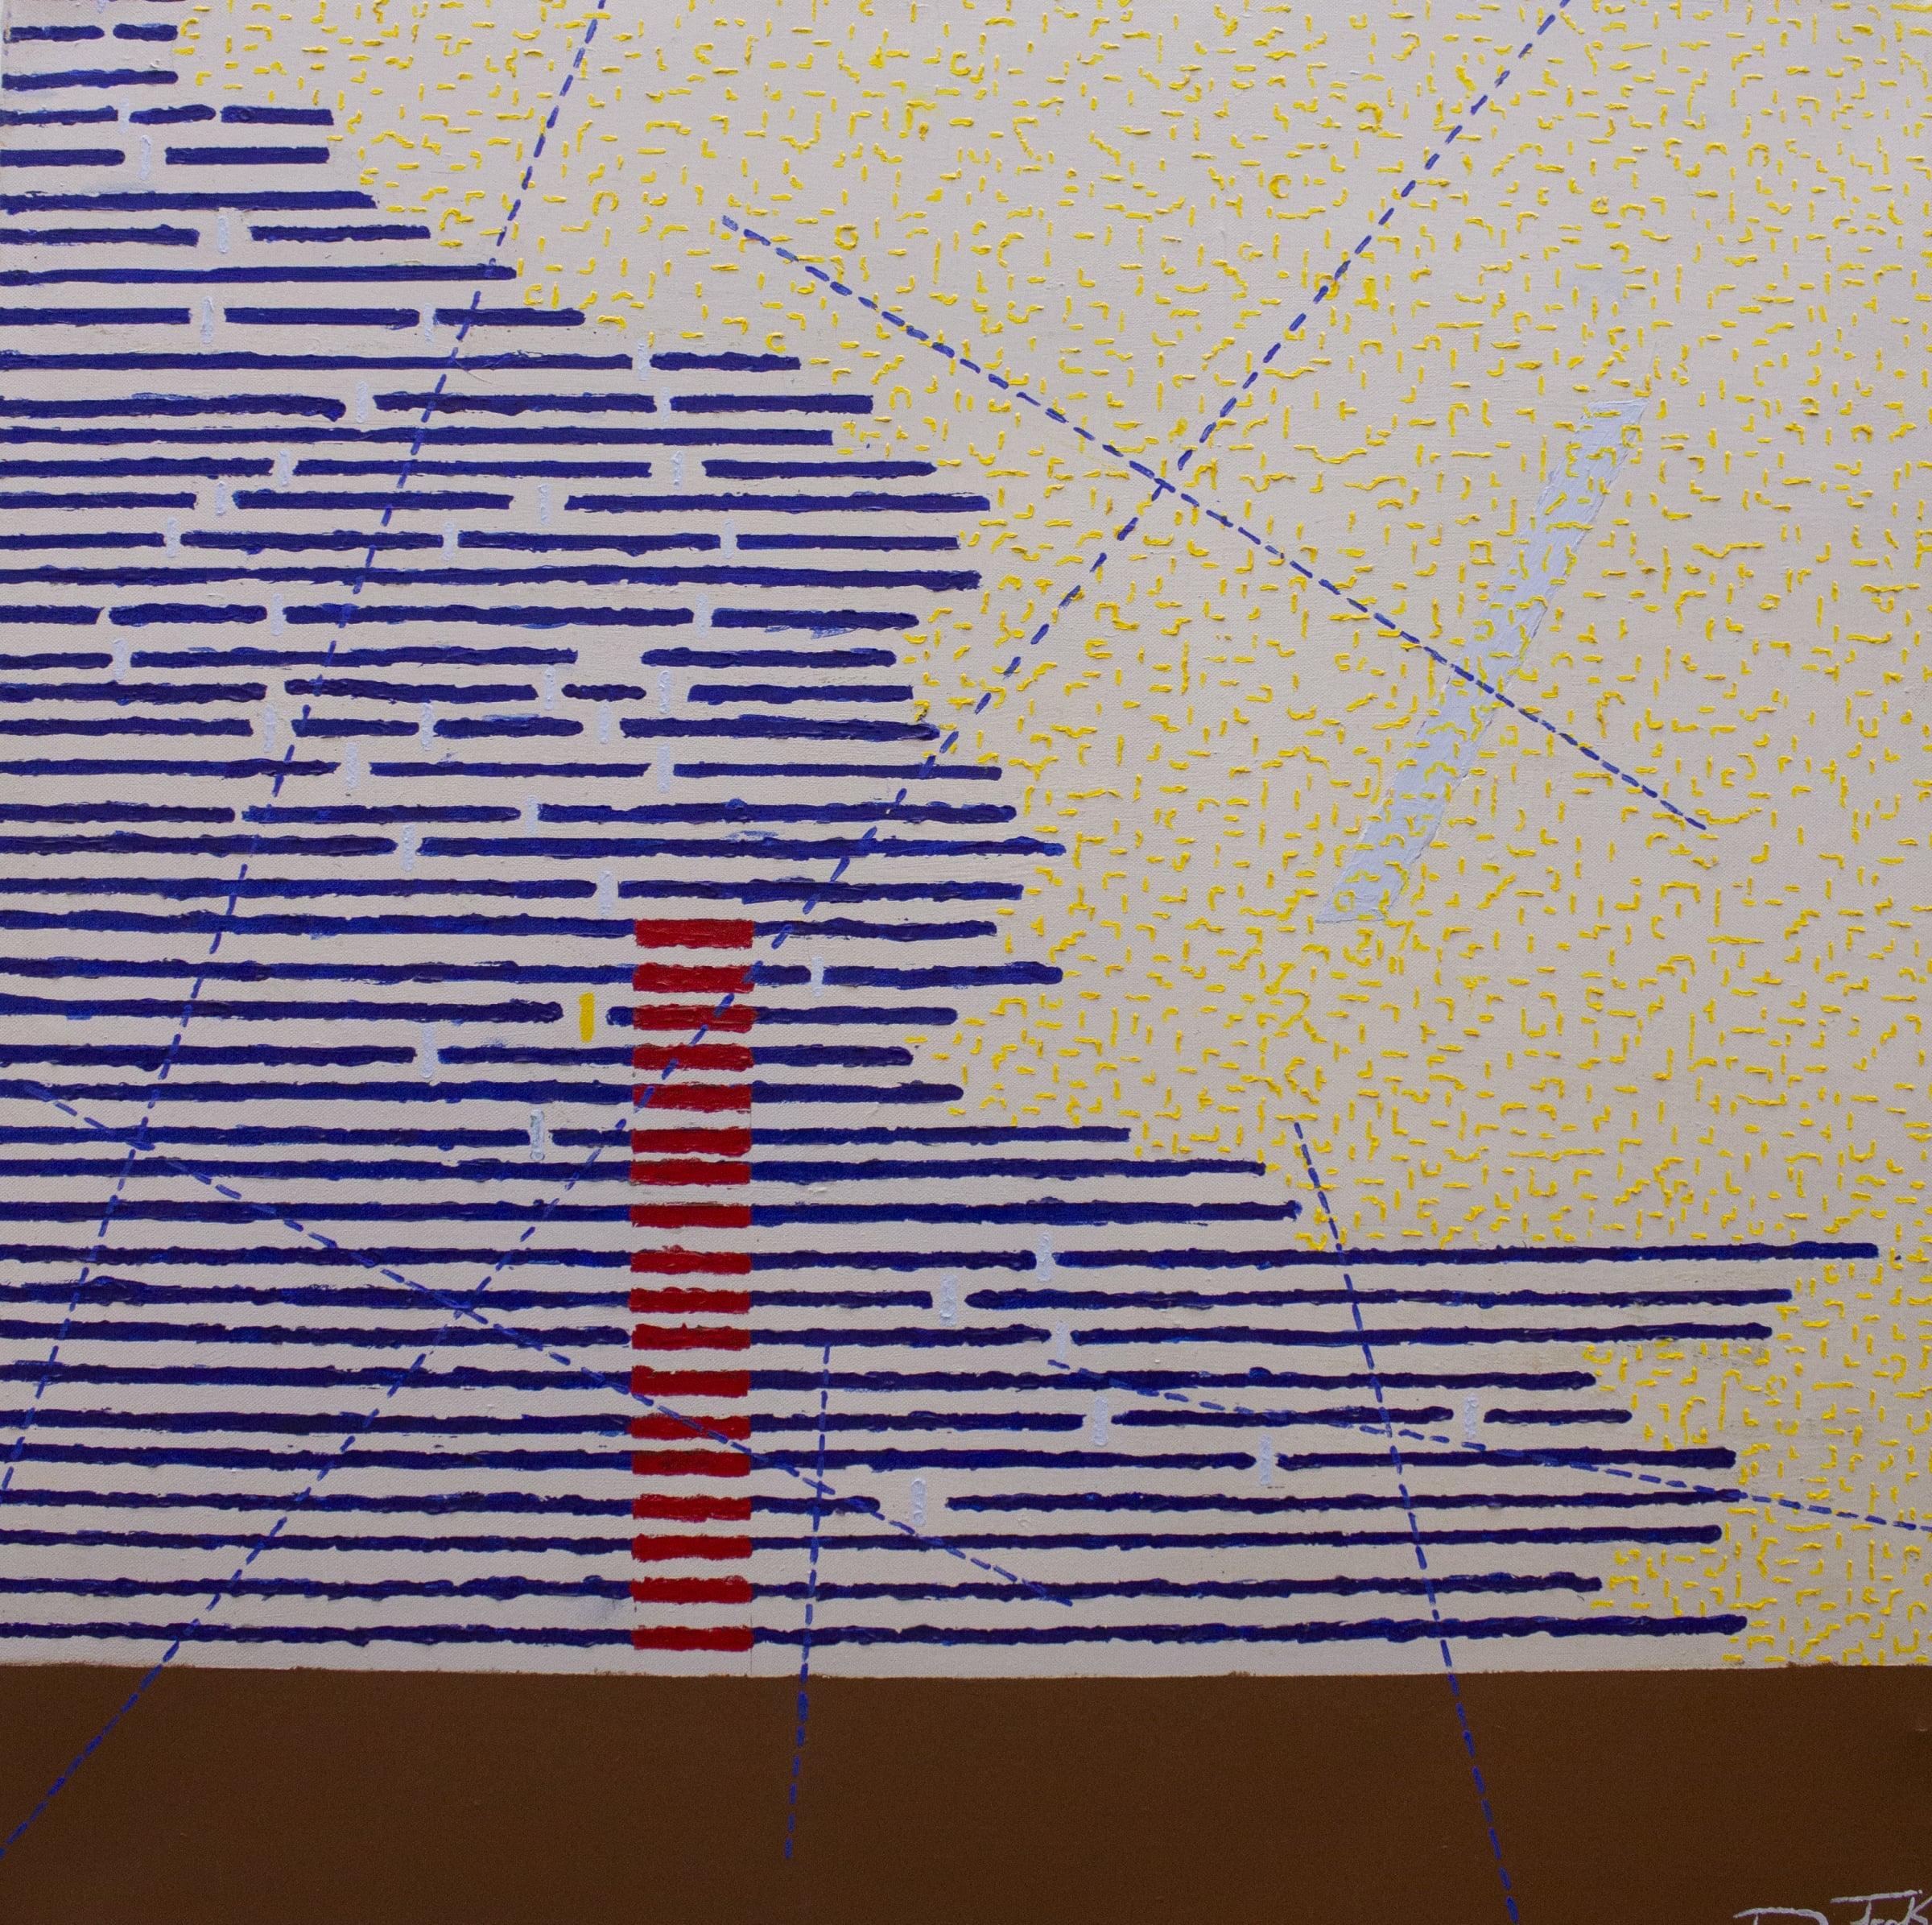 <span class=&#34;link fancybox-details-link&#34;><a href=&#34;/artists/67-david-tsoka/works/1161-david-tsoka-hidden-colours-roots-2016/&#34;>View Detail Page</a></span><div class=&#34;artist&#34;><strong>David Tsoka</strong></div> <div class=&#34;title&#34;><em>Hidden Colours (Roots)</em>, 2016</div> <div class=&#34;medium&#34;>Acrylic & Oil On Canvas</div> <div class=&#34;dimensions&#34;>91cm x 91cm</div><div class=&#34;price&#34;>R9,100.00</div>